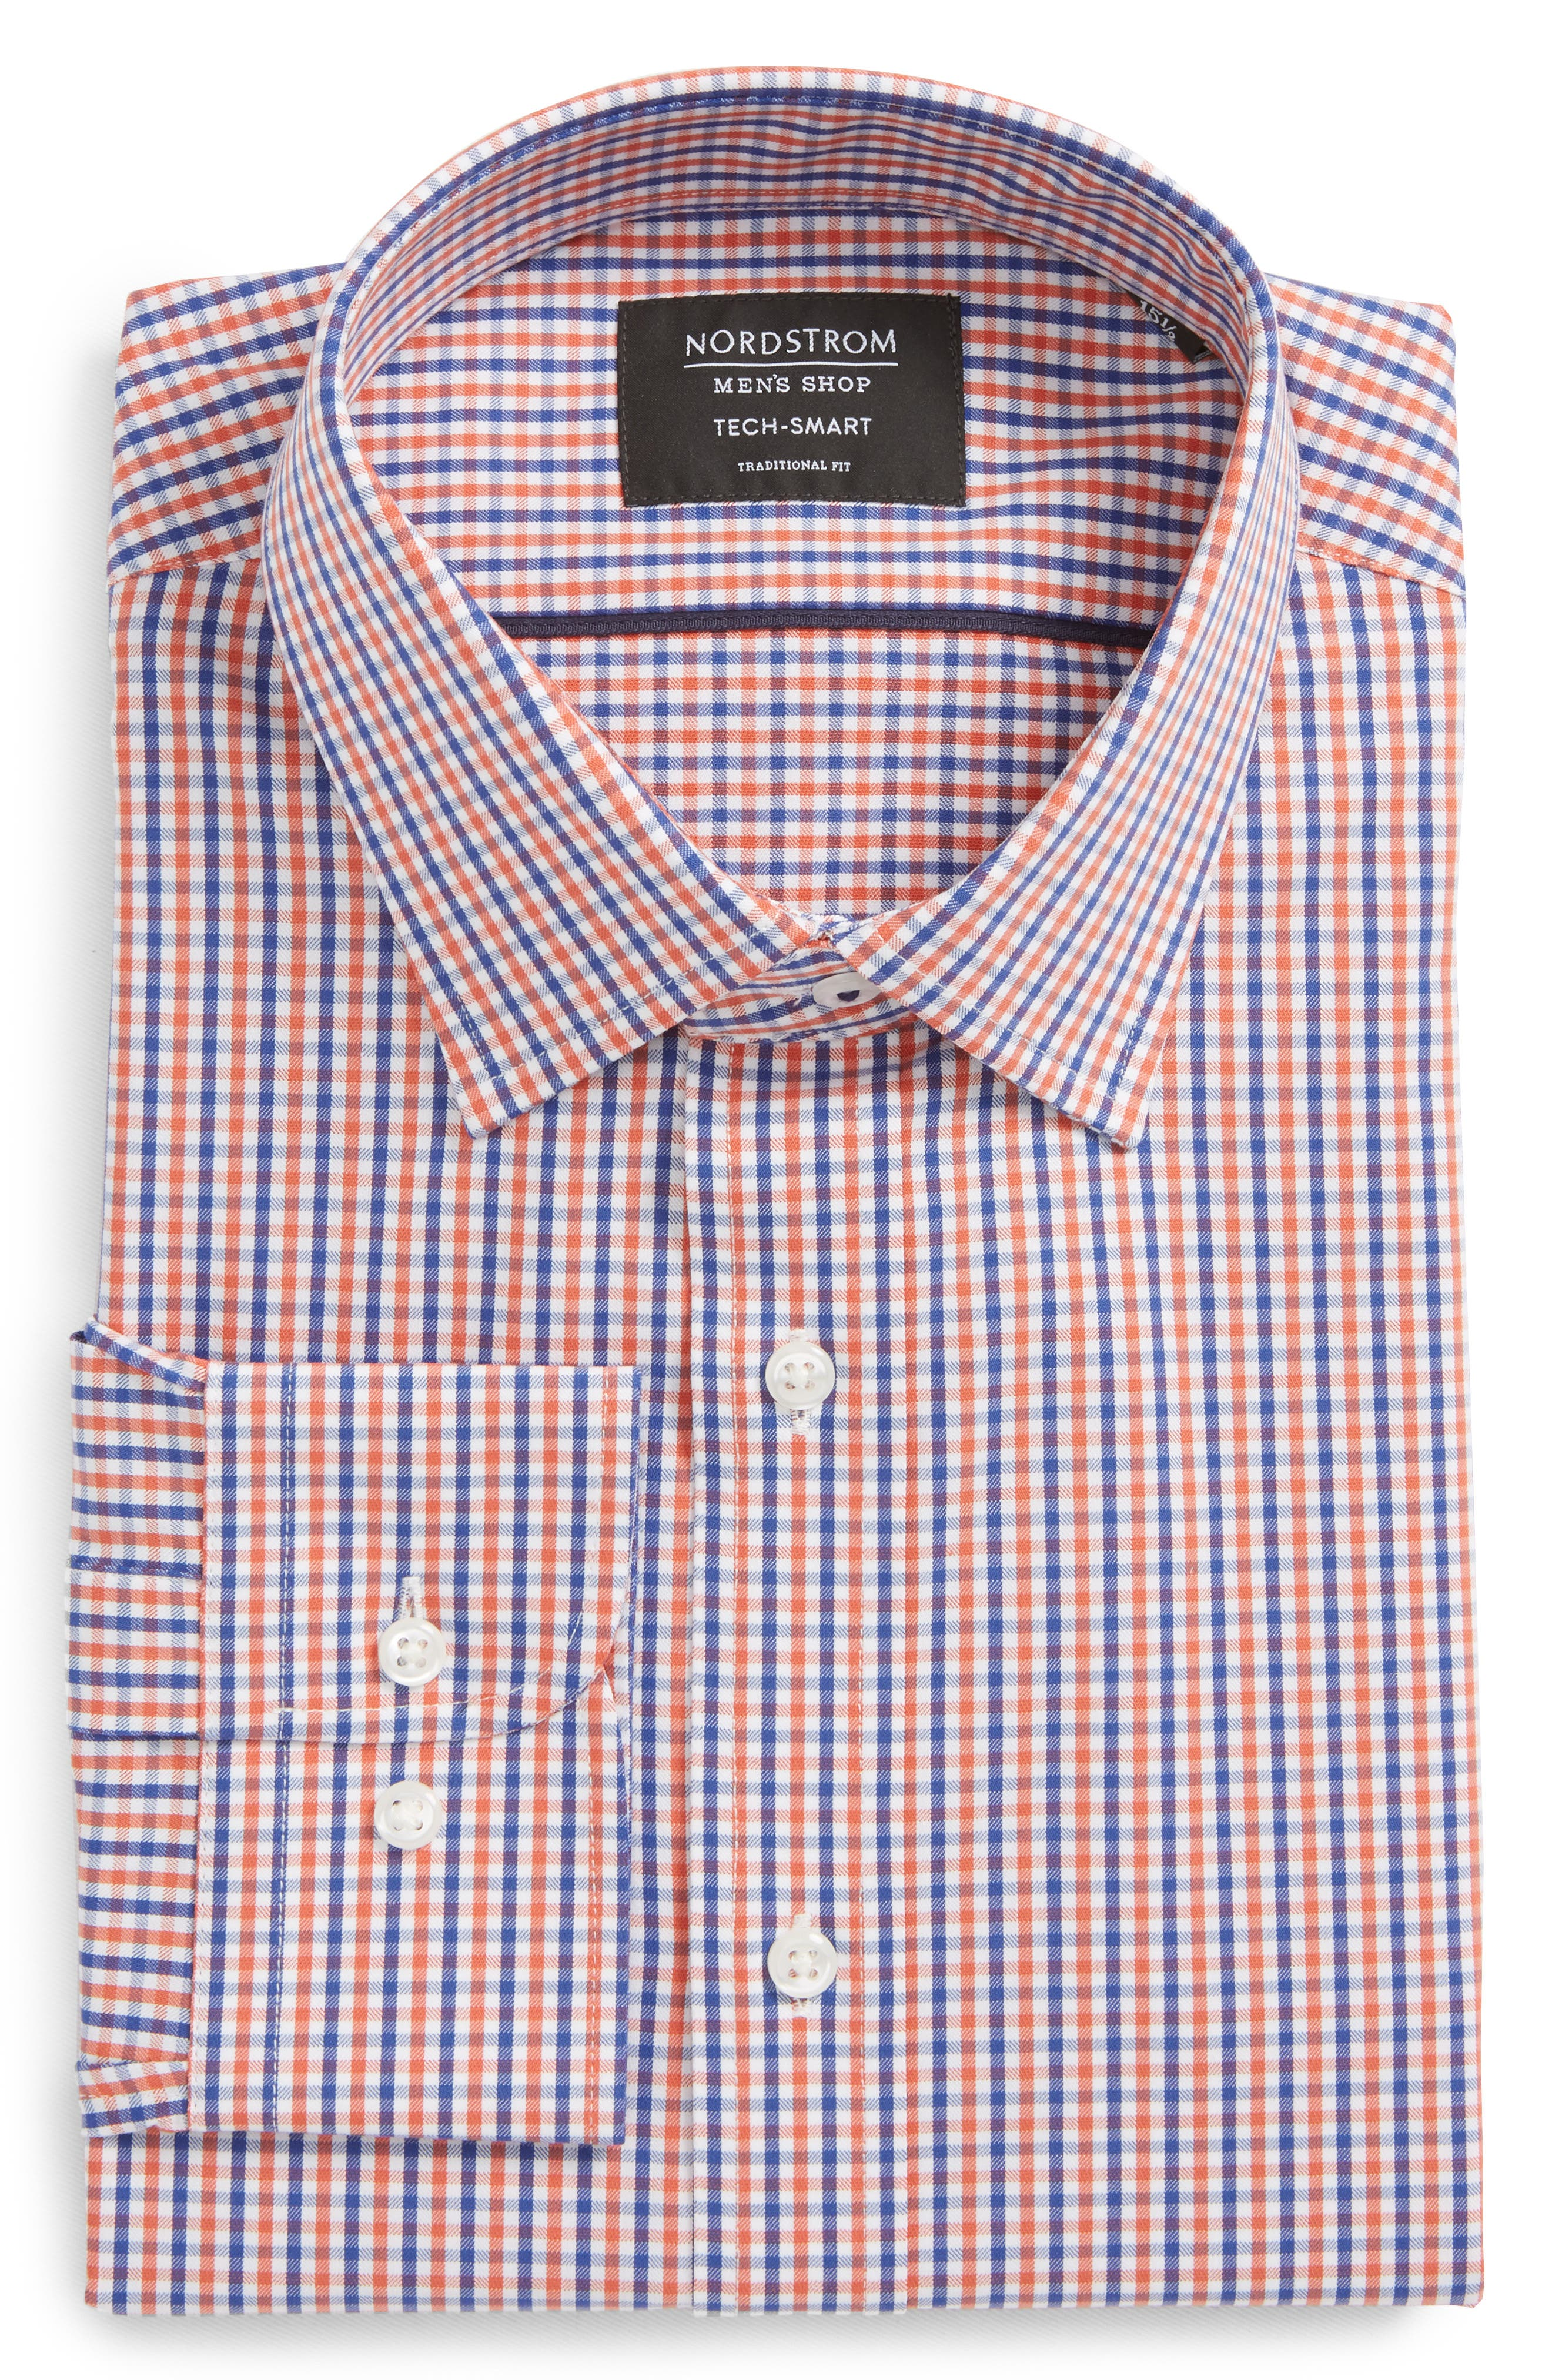 Nordstrom Men's Shop Tech-Smart Traditional Fit Stretch Check Dress Shirt